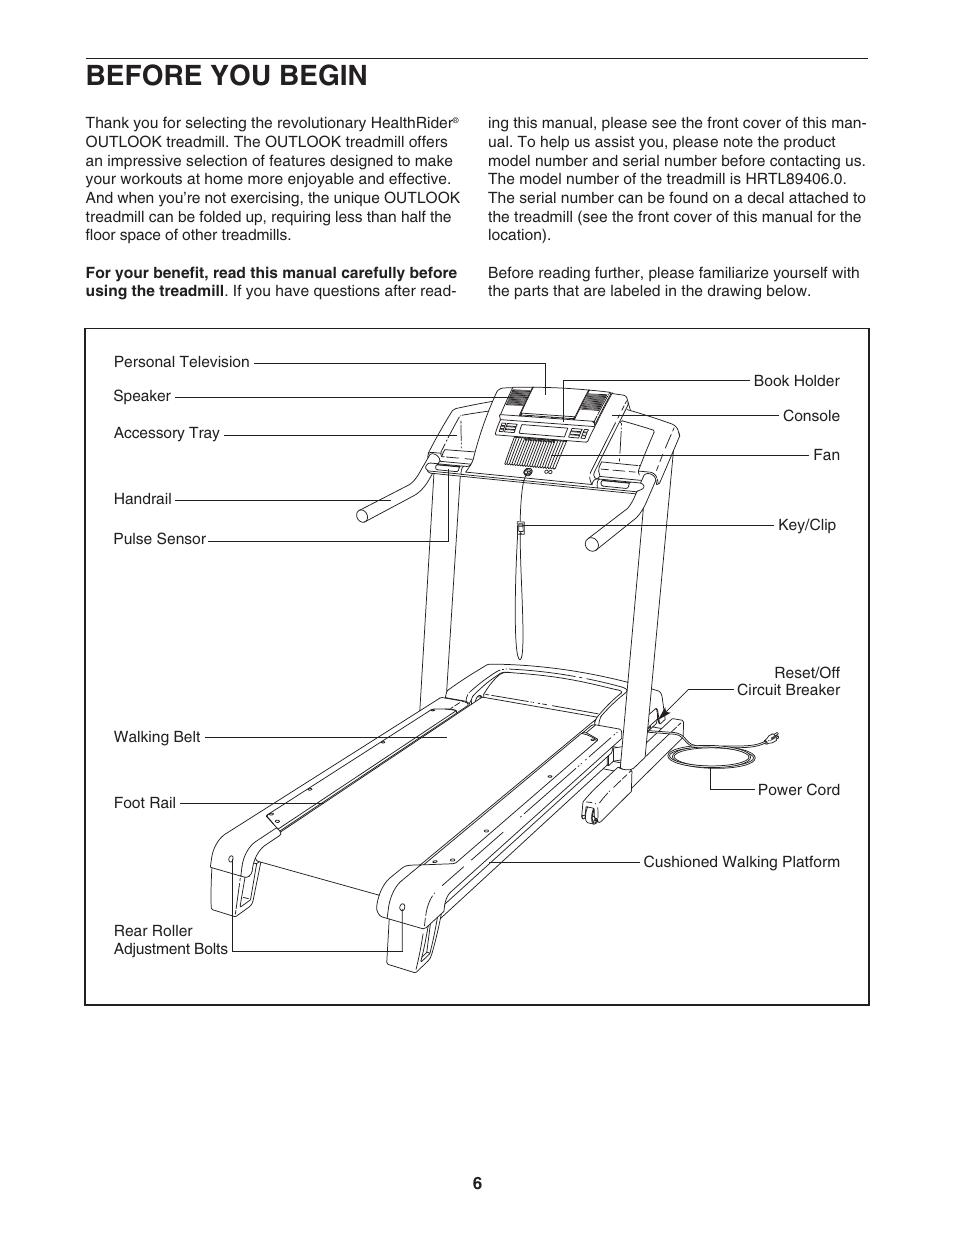 Healthrider hrtl89406. 0 user's manual | manualzz. Com.